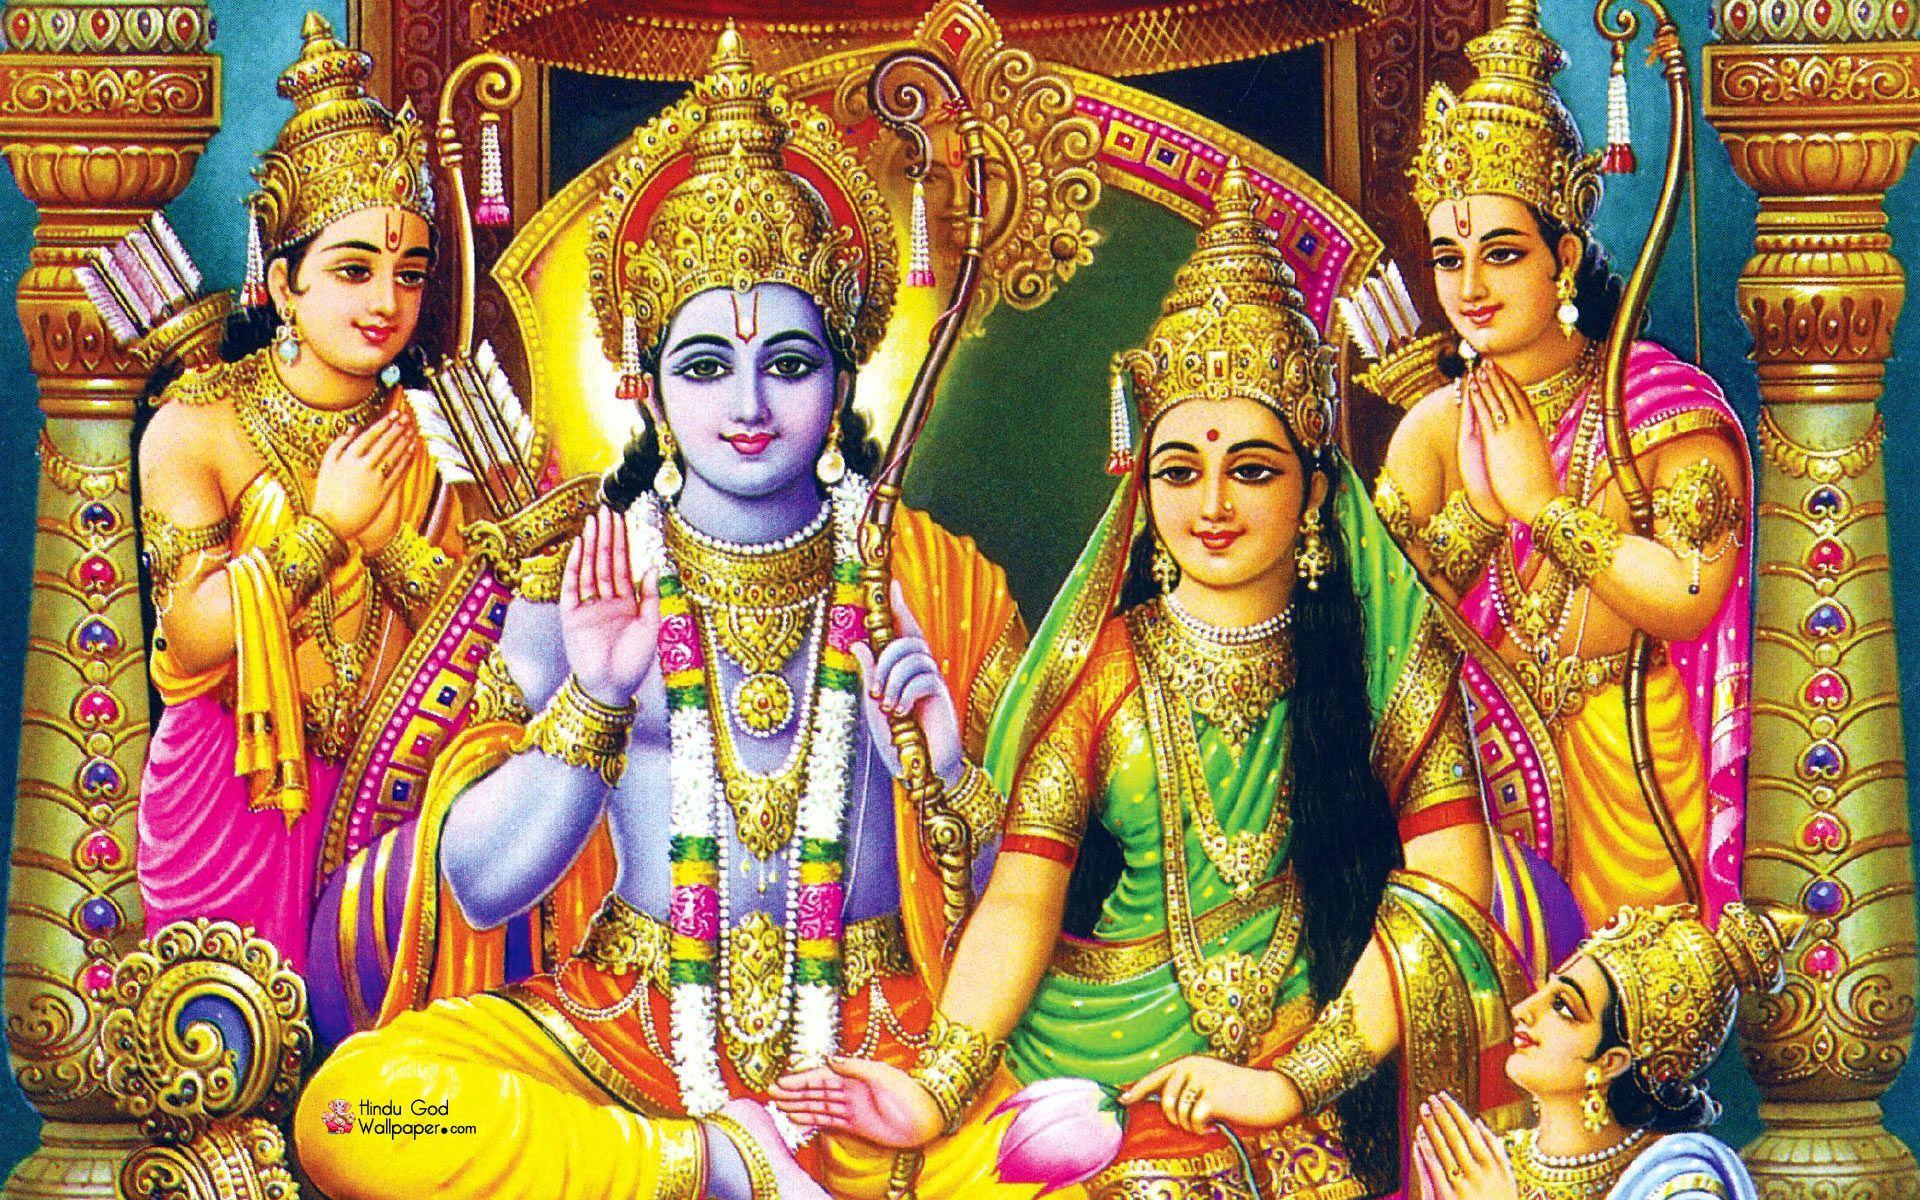 Ram Darbar Hd Wallpapers Full Size Free Download - God Rama And Sita - HD Wallpaper